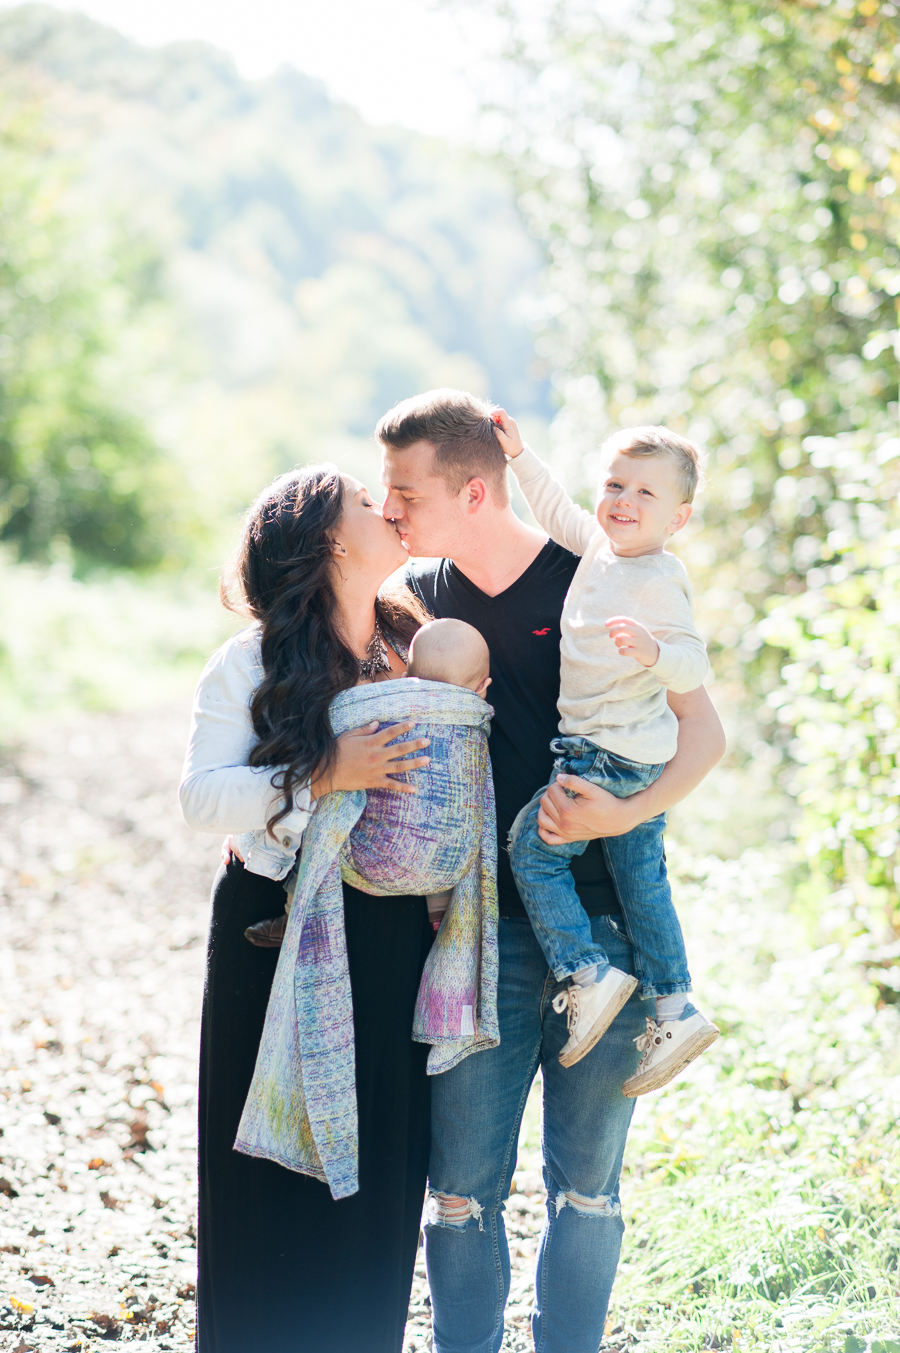 Familienshooting-12